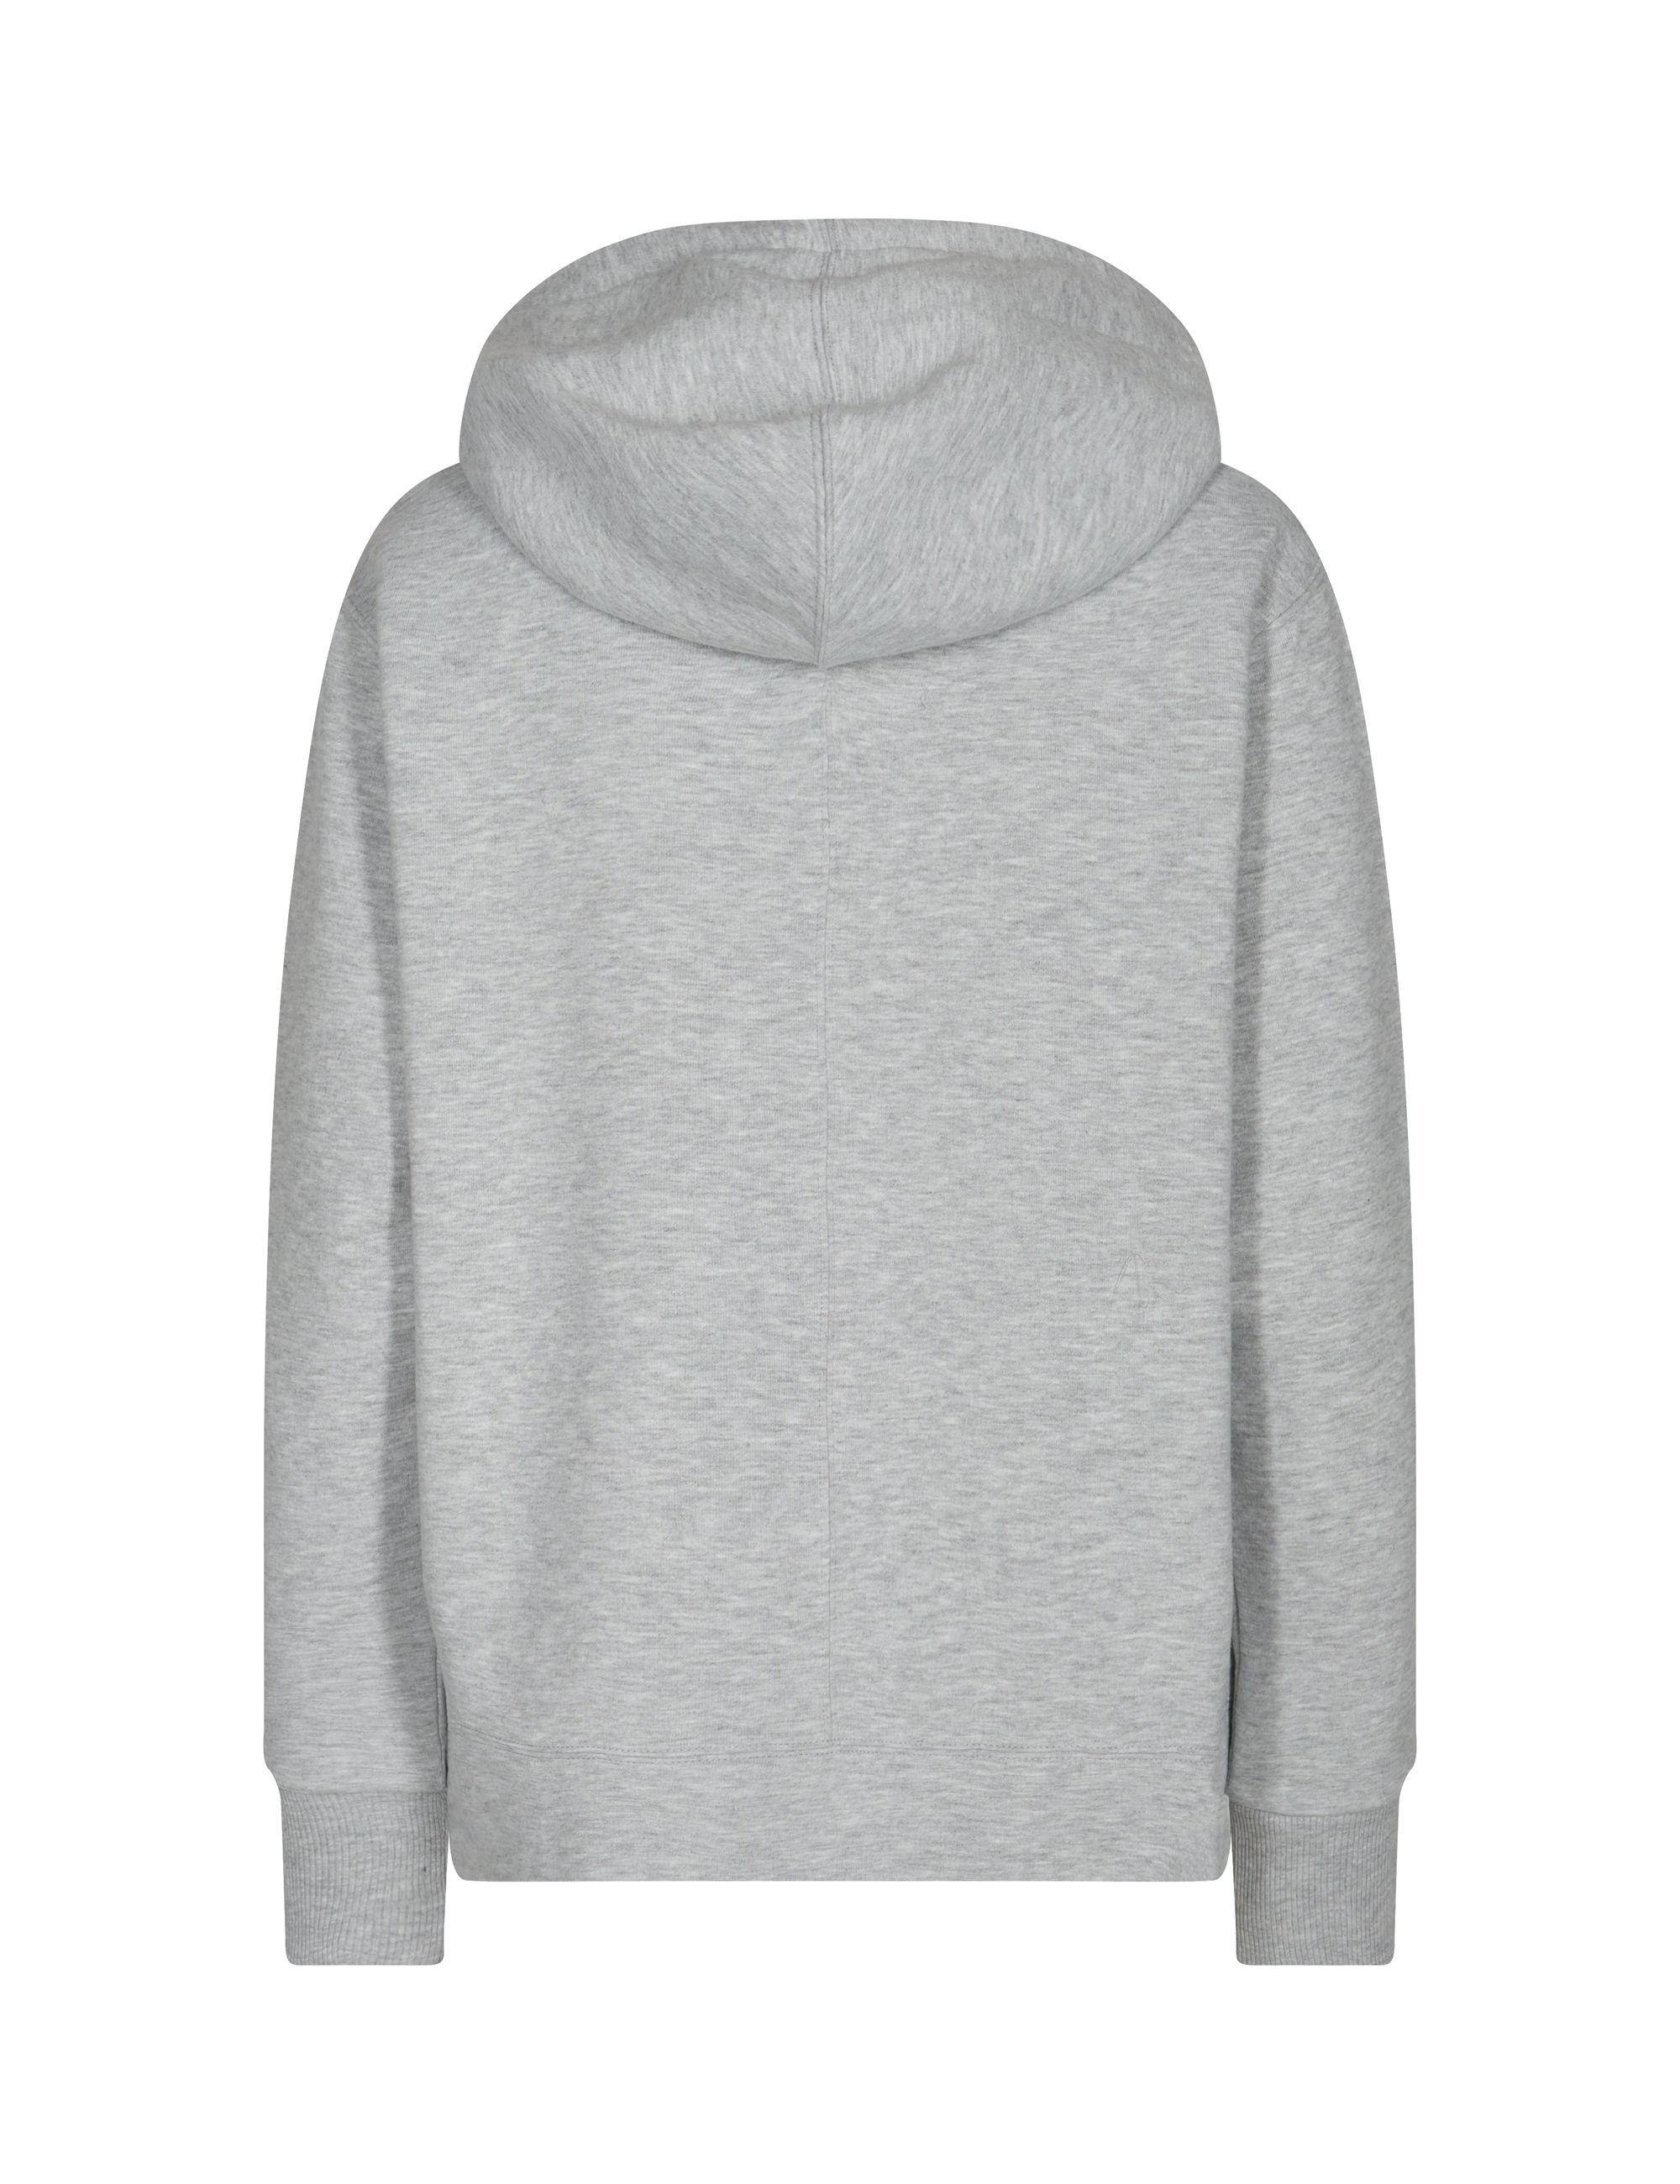 Nuka hoodie